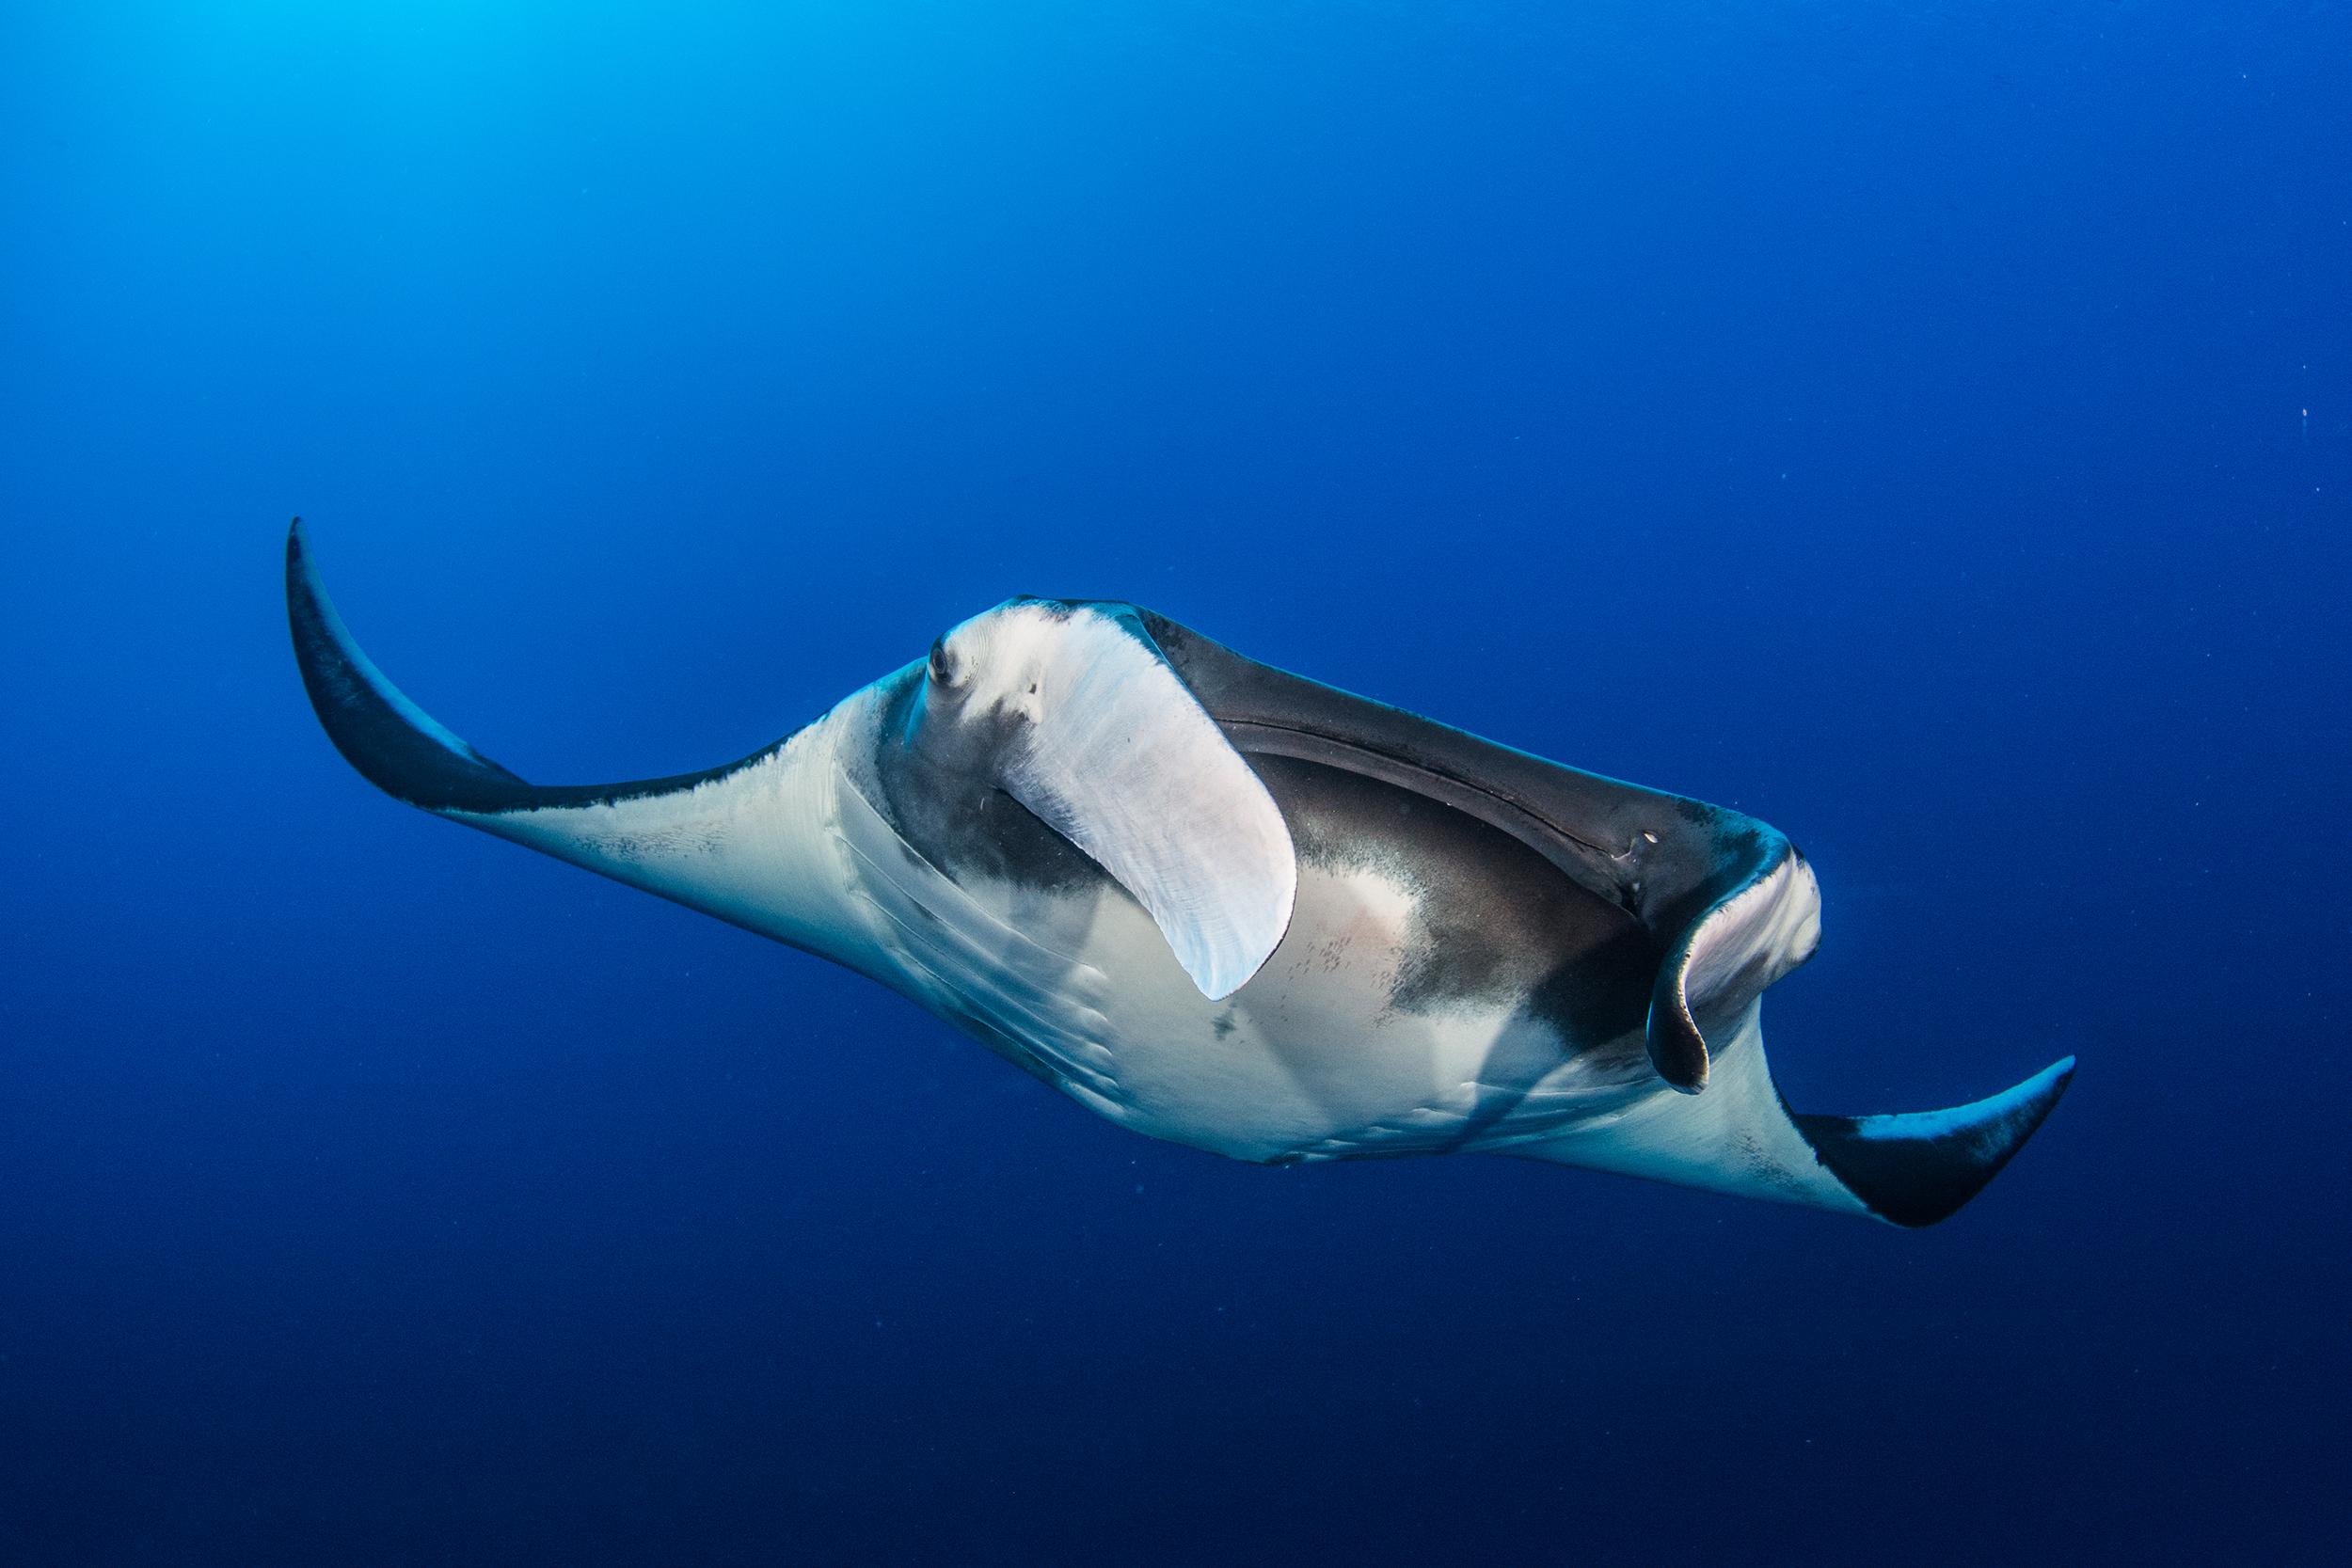 Manta In the Maldives Credit: Simon Hilbourne / Coral Reef Image Bank